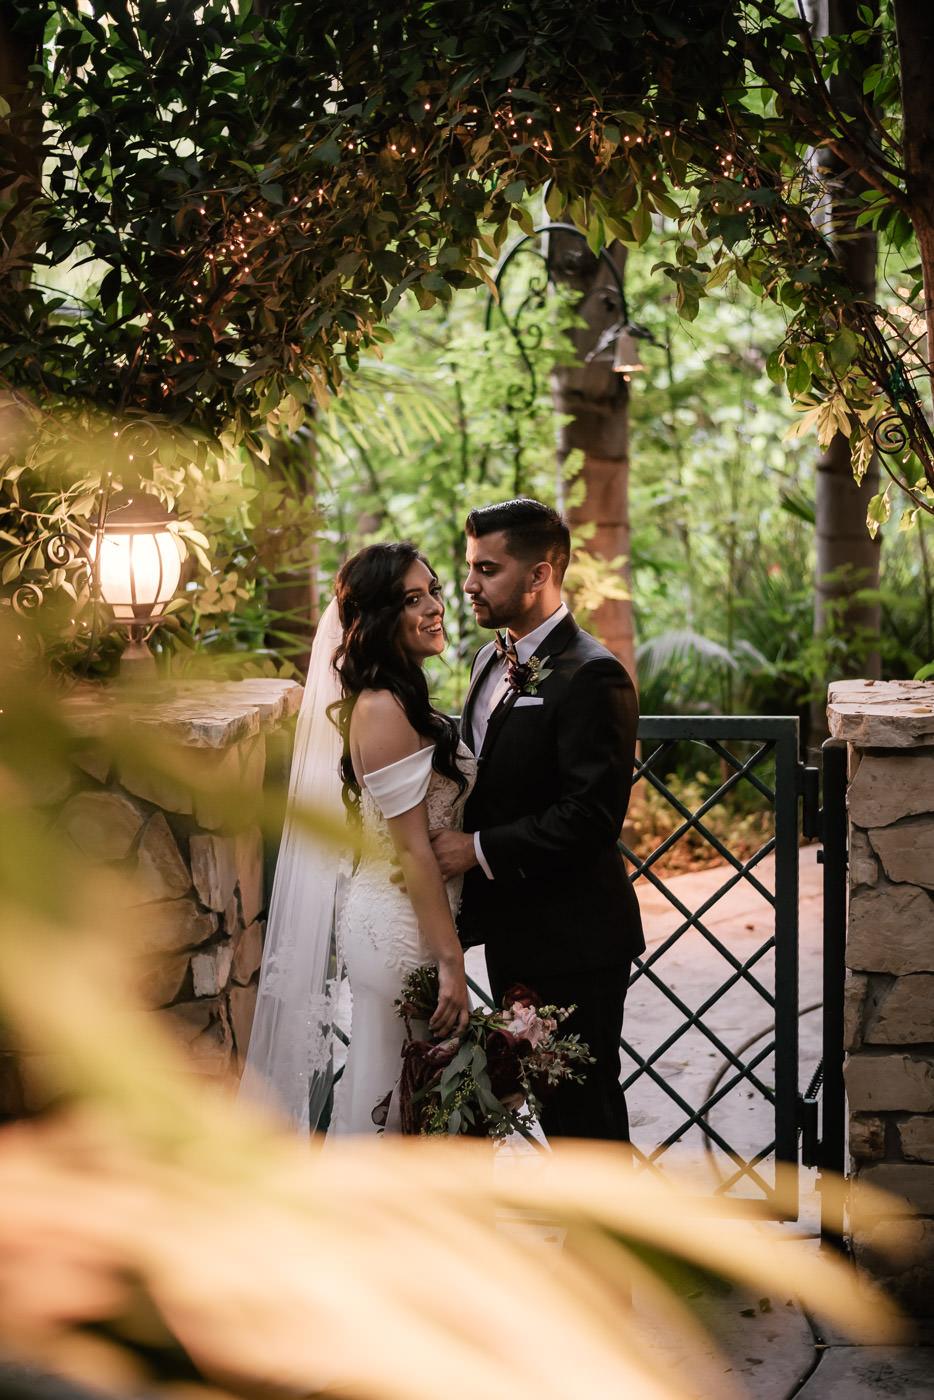 eden-gardens-wedding-photographer-romantic-83.jpg